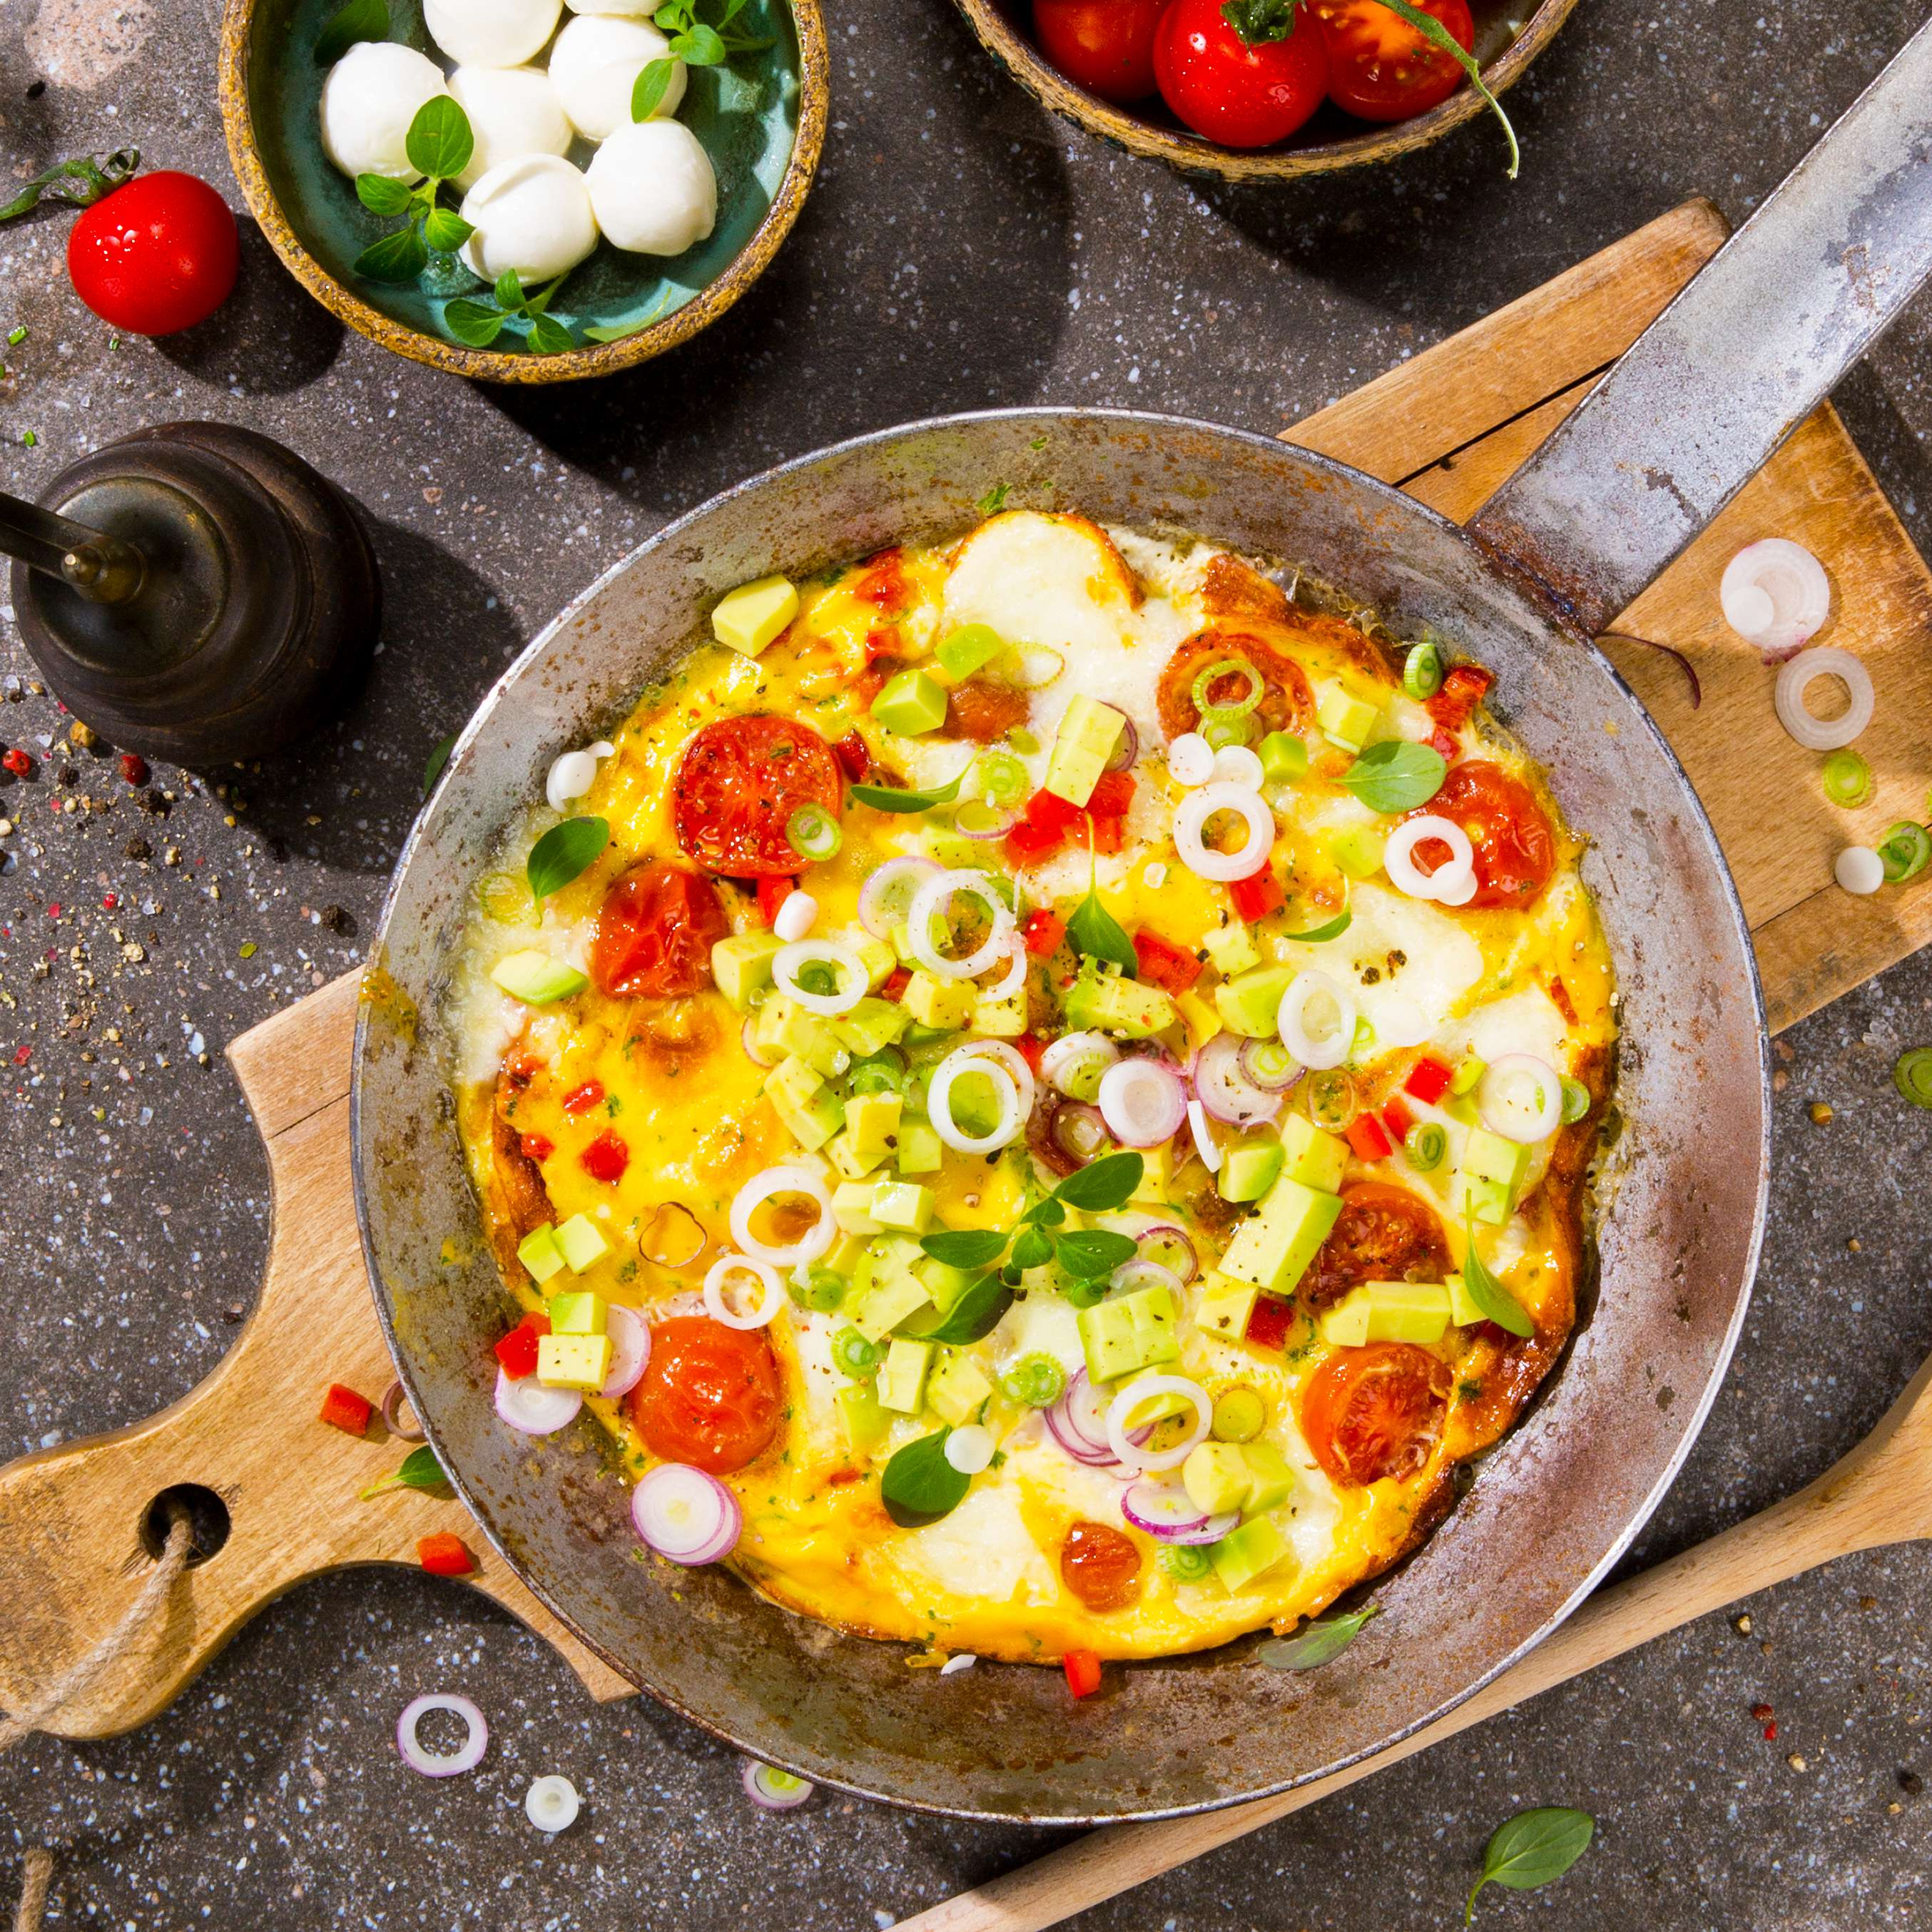 rezept f r omelette mit tomaten und mozzarella kaufland. Black Bedroom Furniture Sets. Home Design Ideas